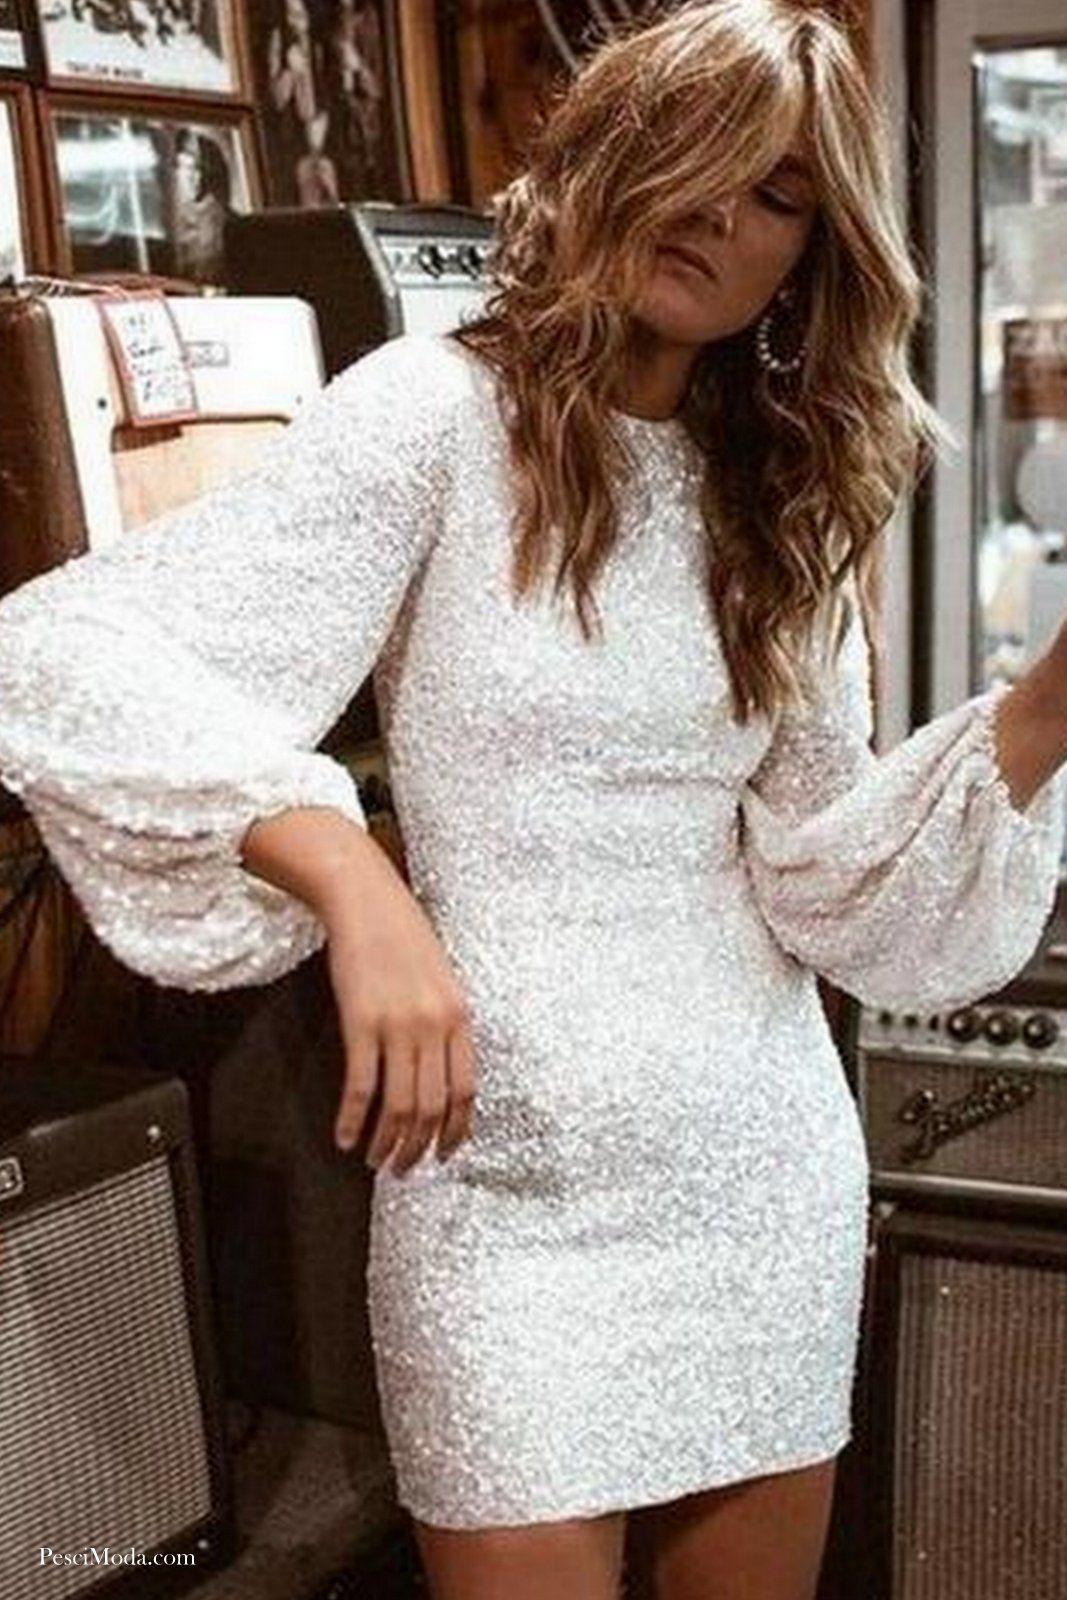 White Sequins Party Dress On Sale Women Long Sleeve Dress Sequin Bodycon Dress Mini Dress Party [ 1600 x 1067 Pixel ]